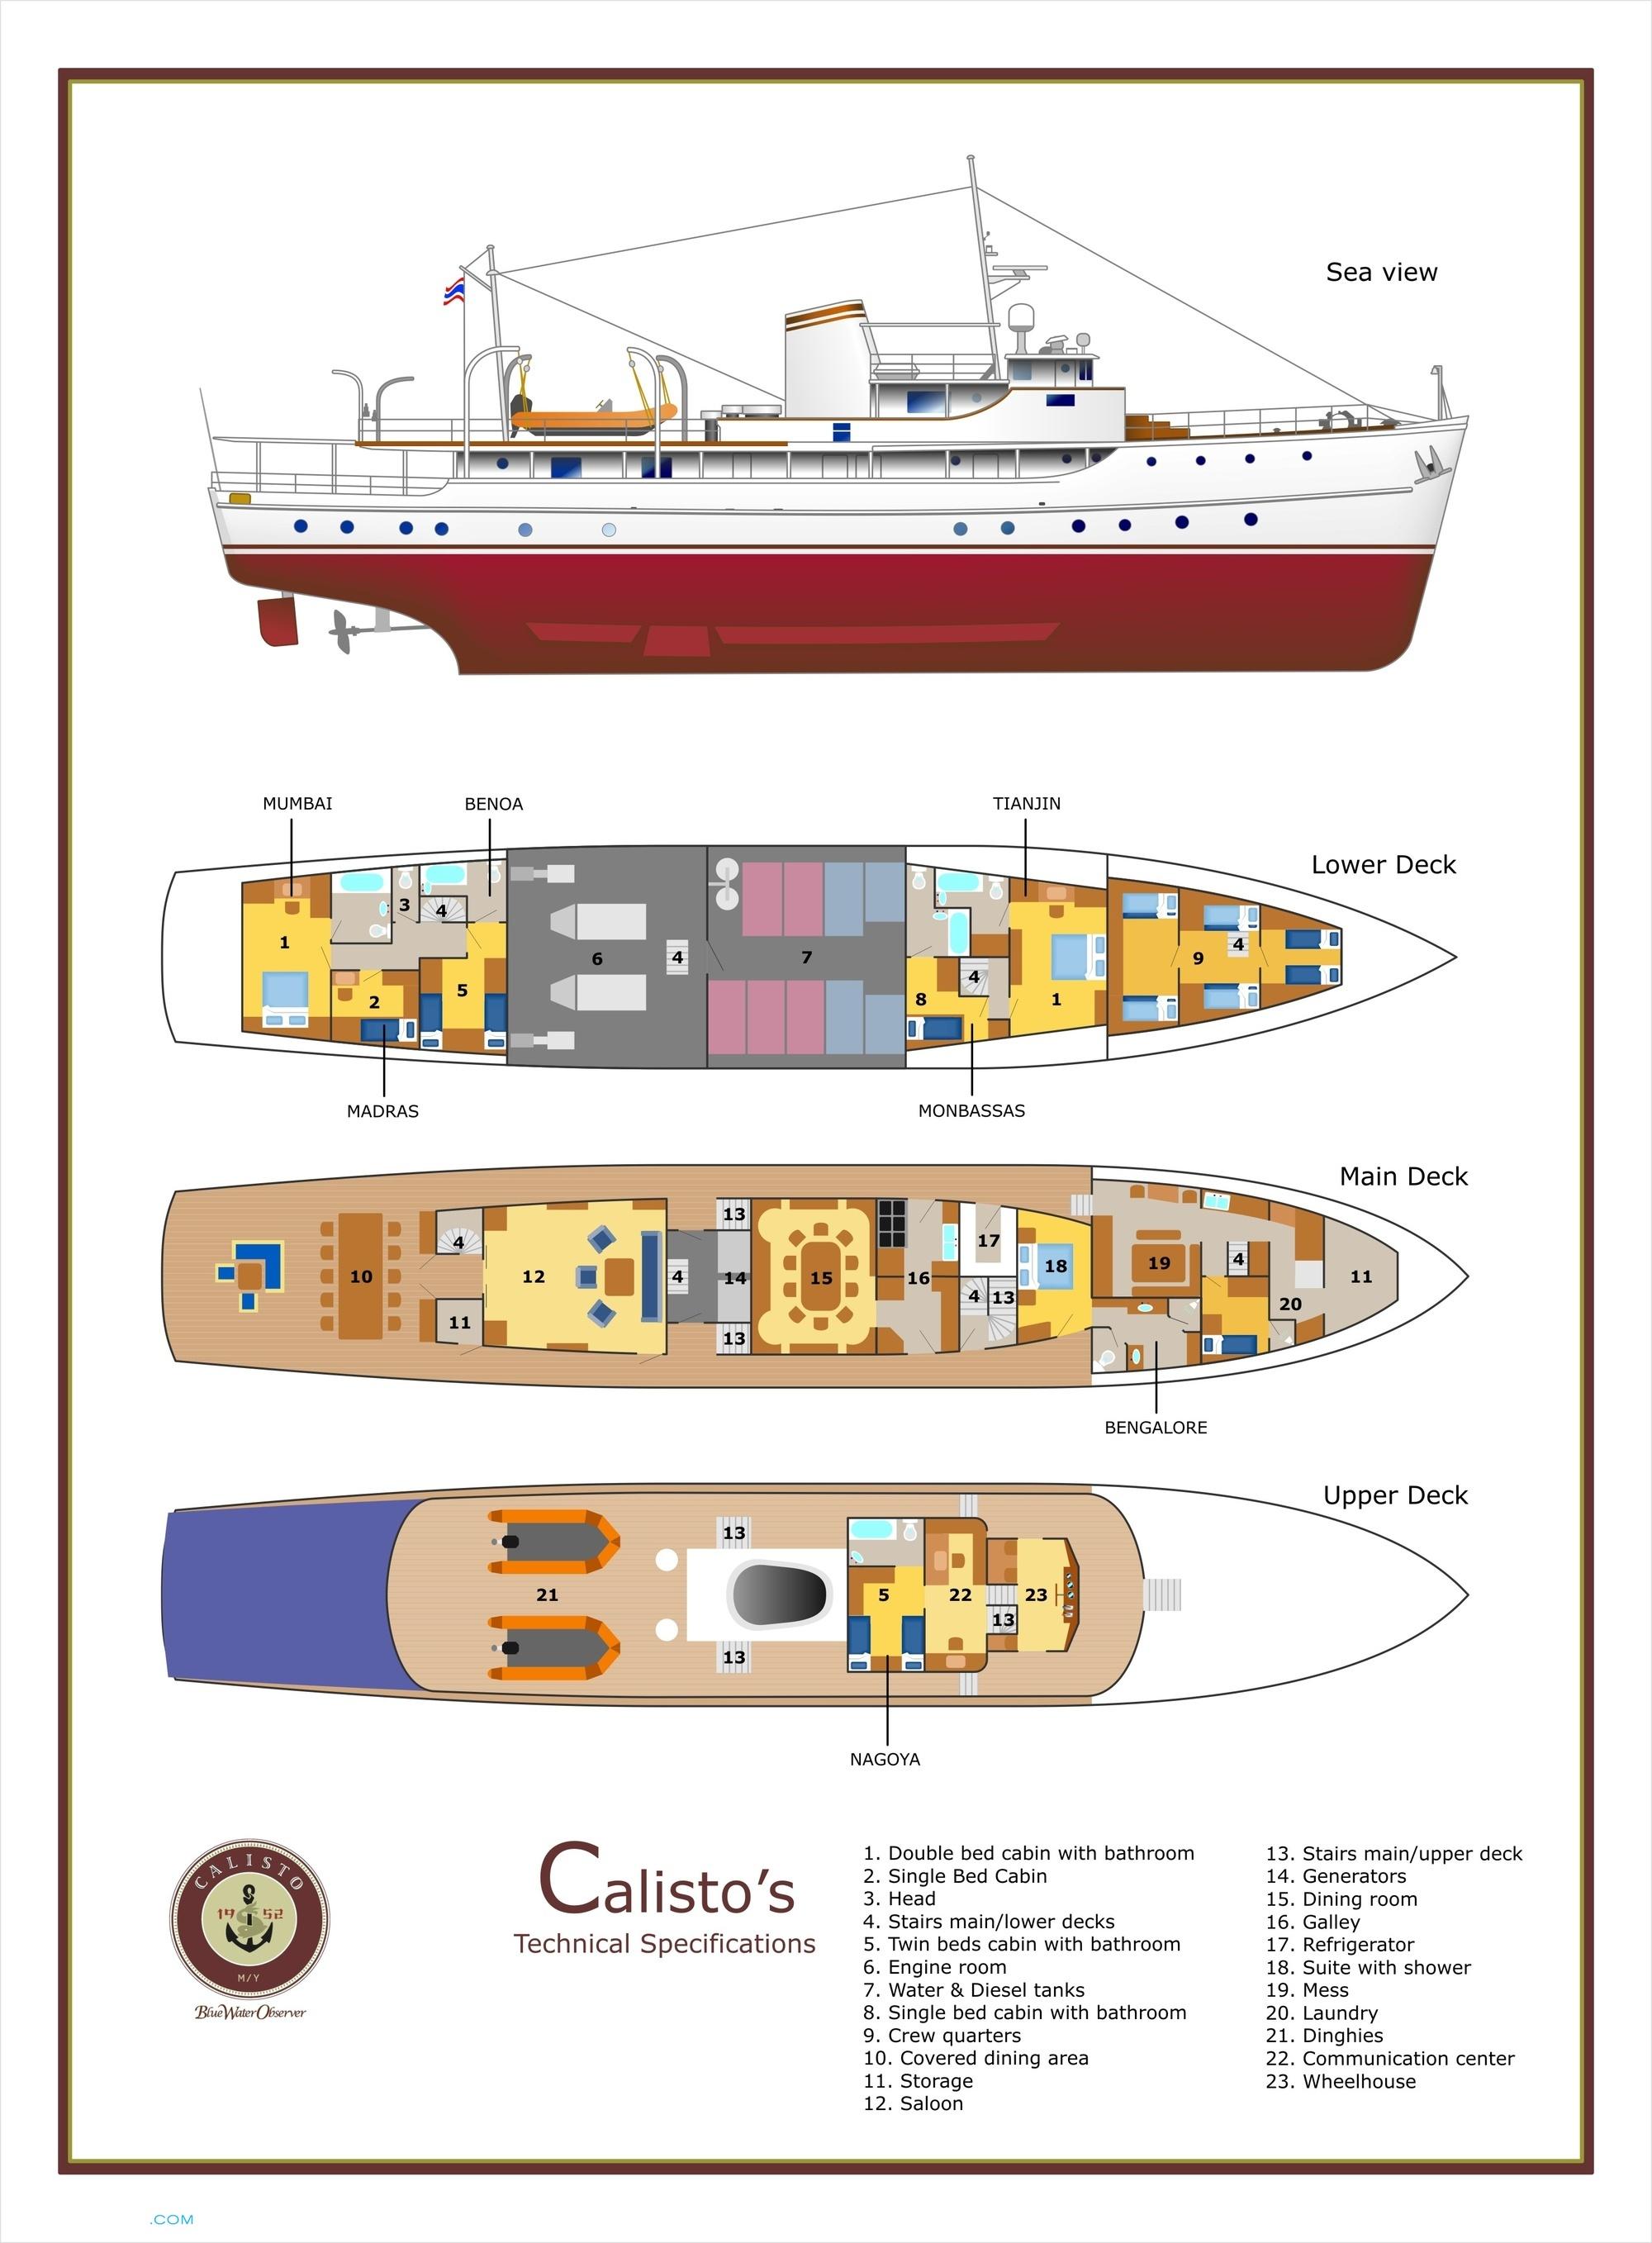 Calisto Layout - Astoria Marine Motor Yacht.. | superyachts.com